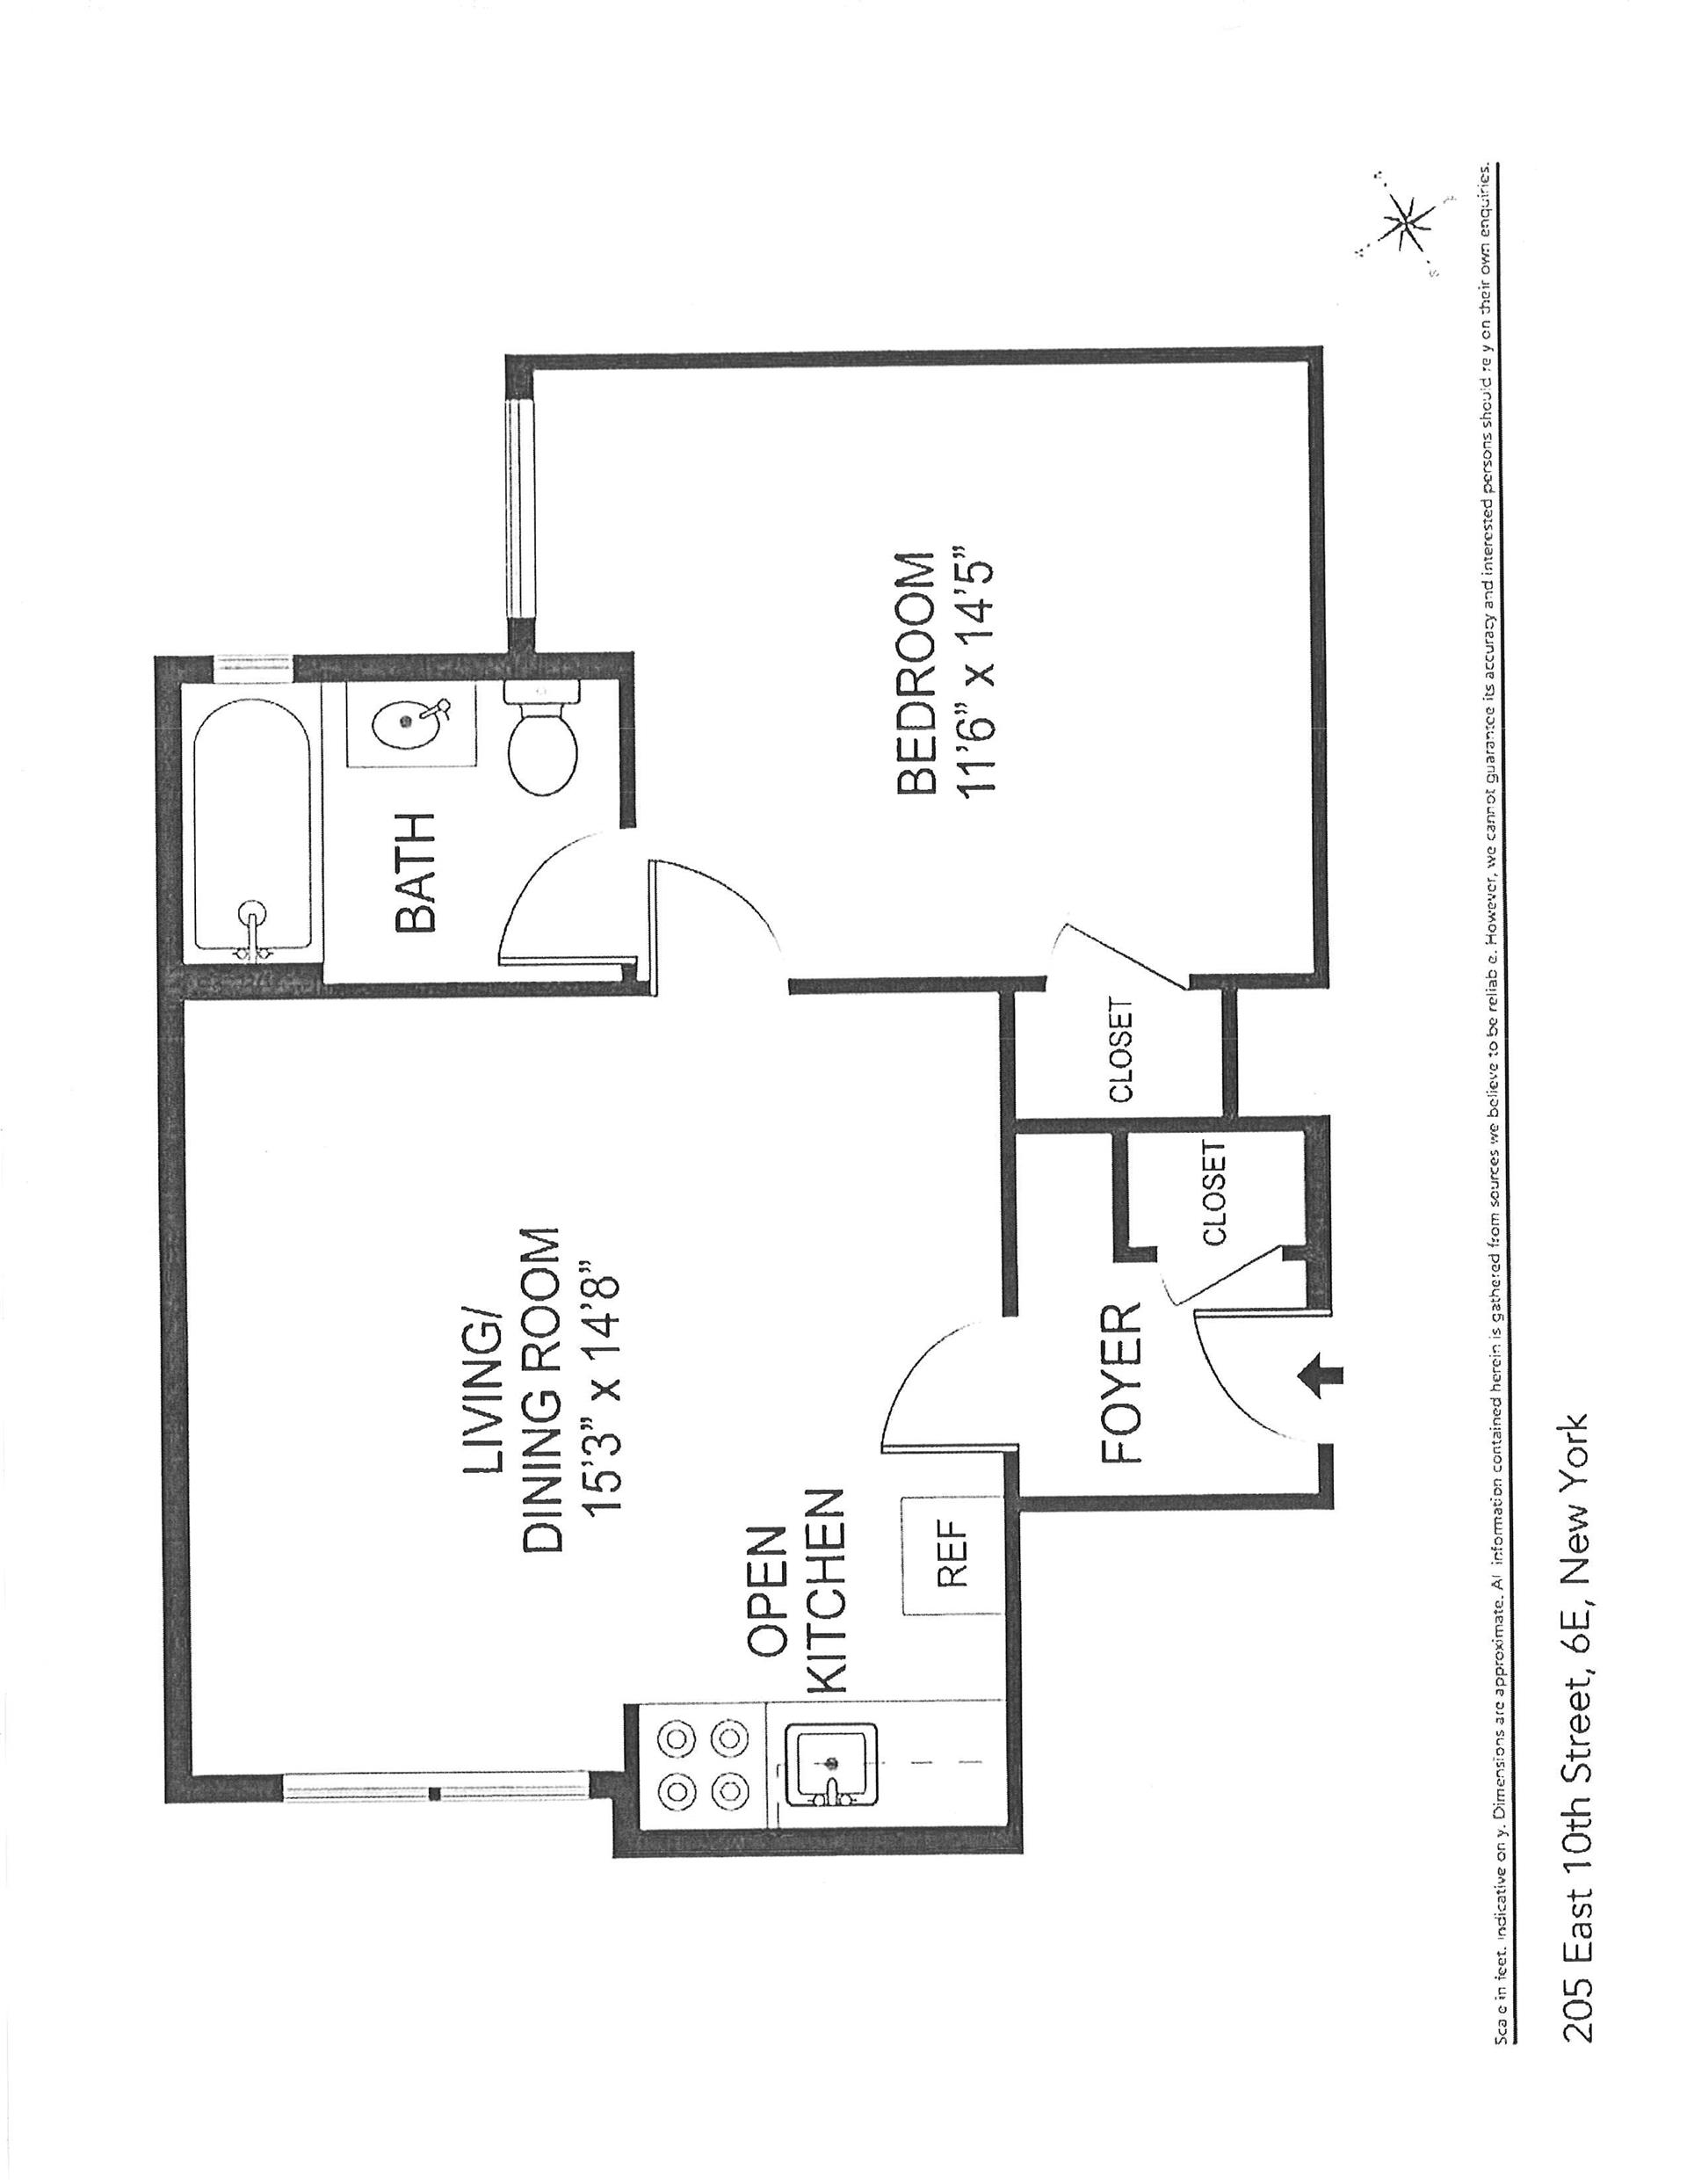 Floor plan of 205 East 10th St, 6E - East Village, New York